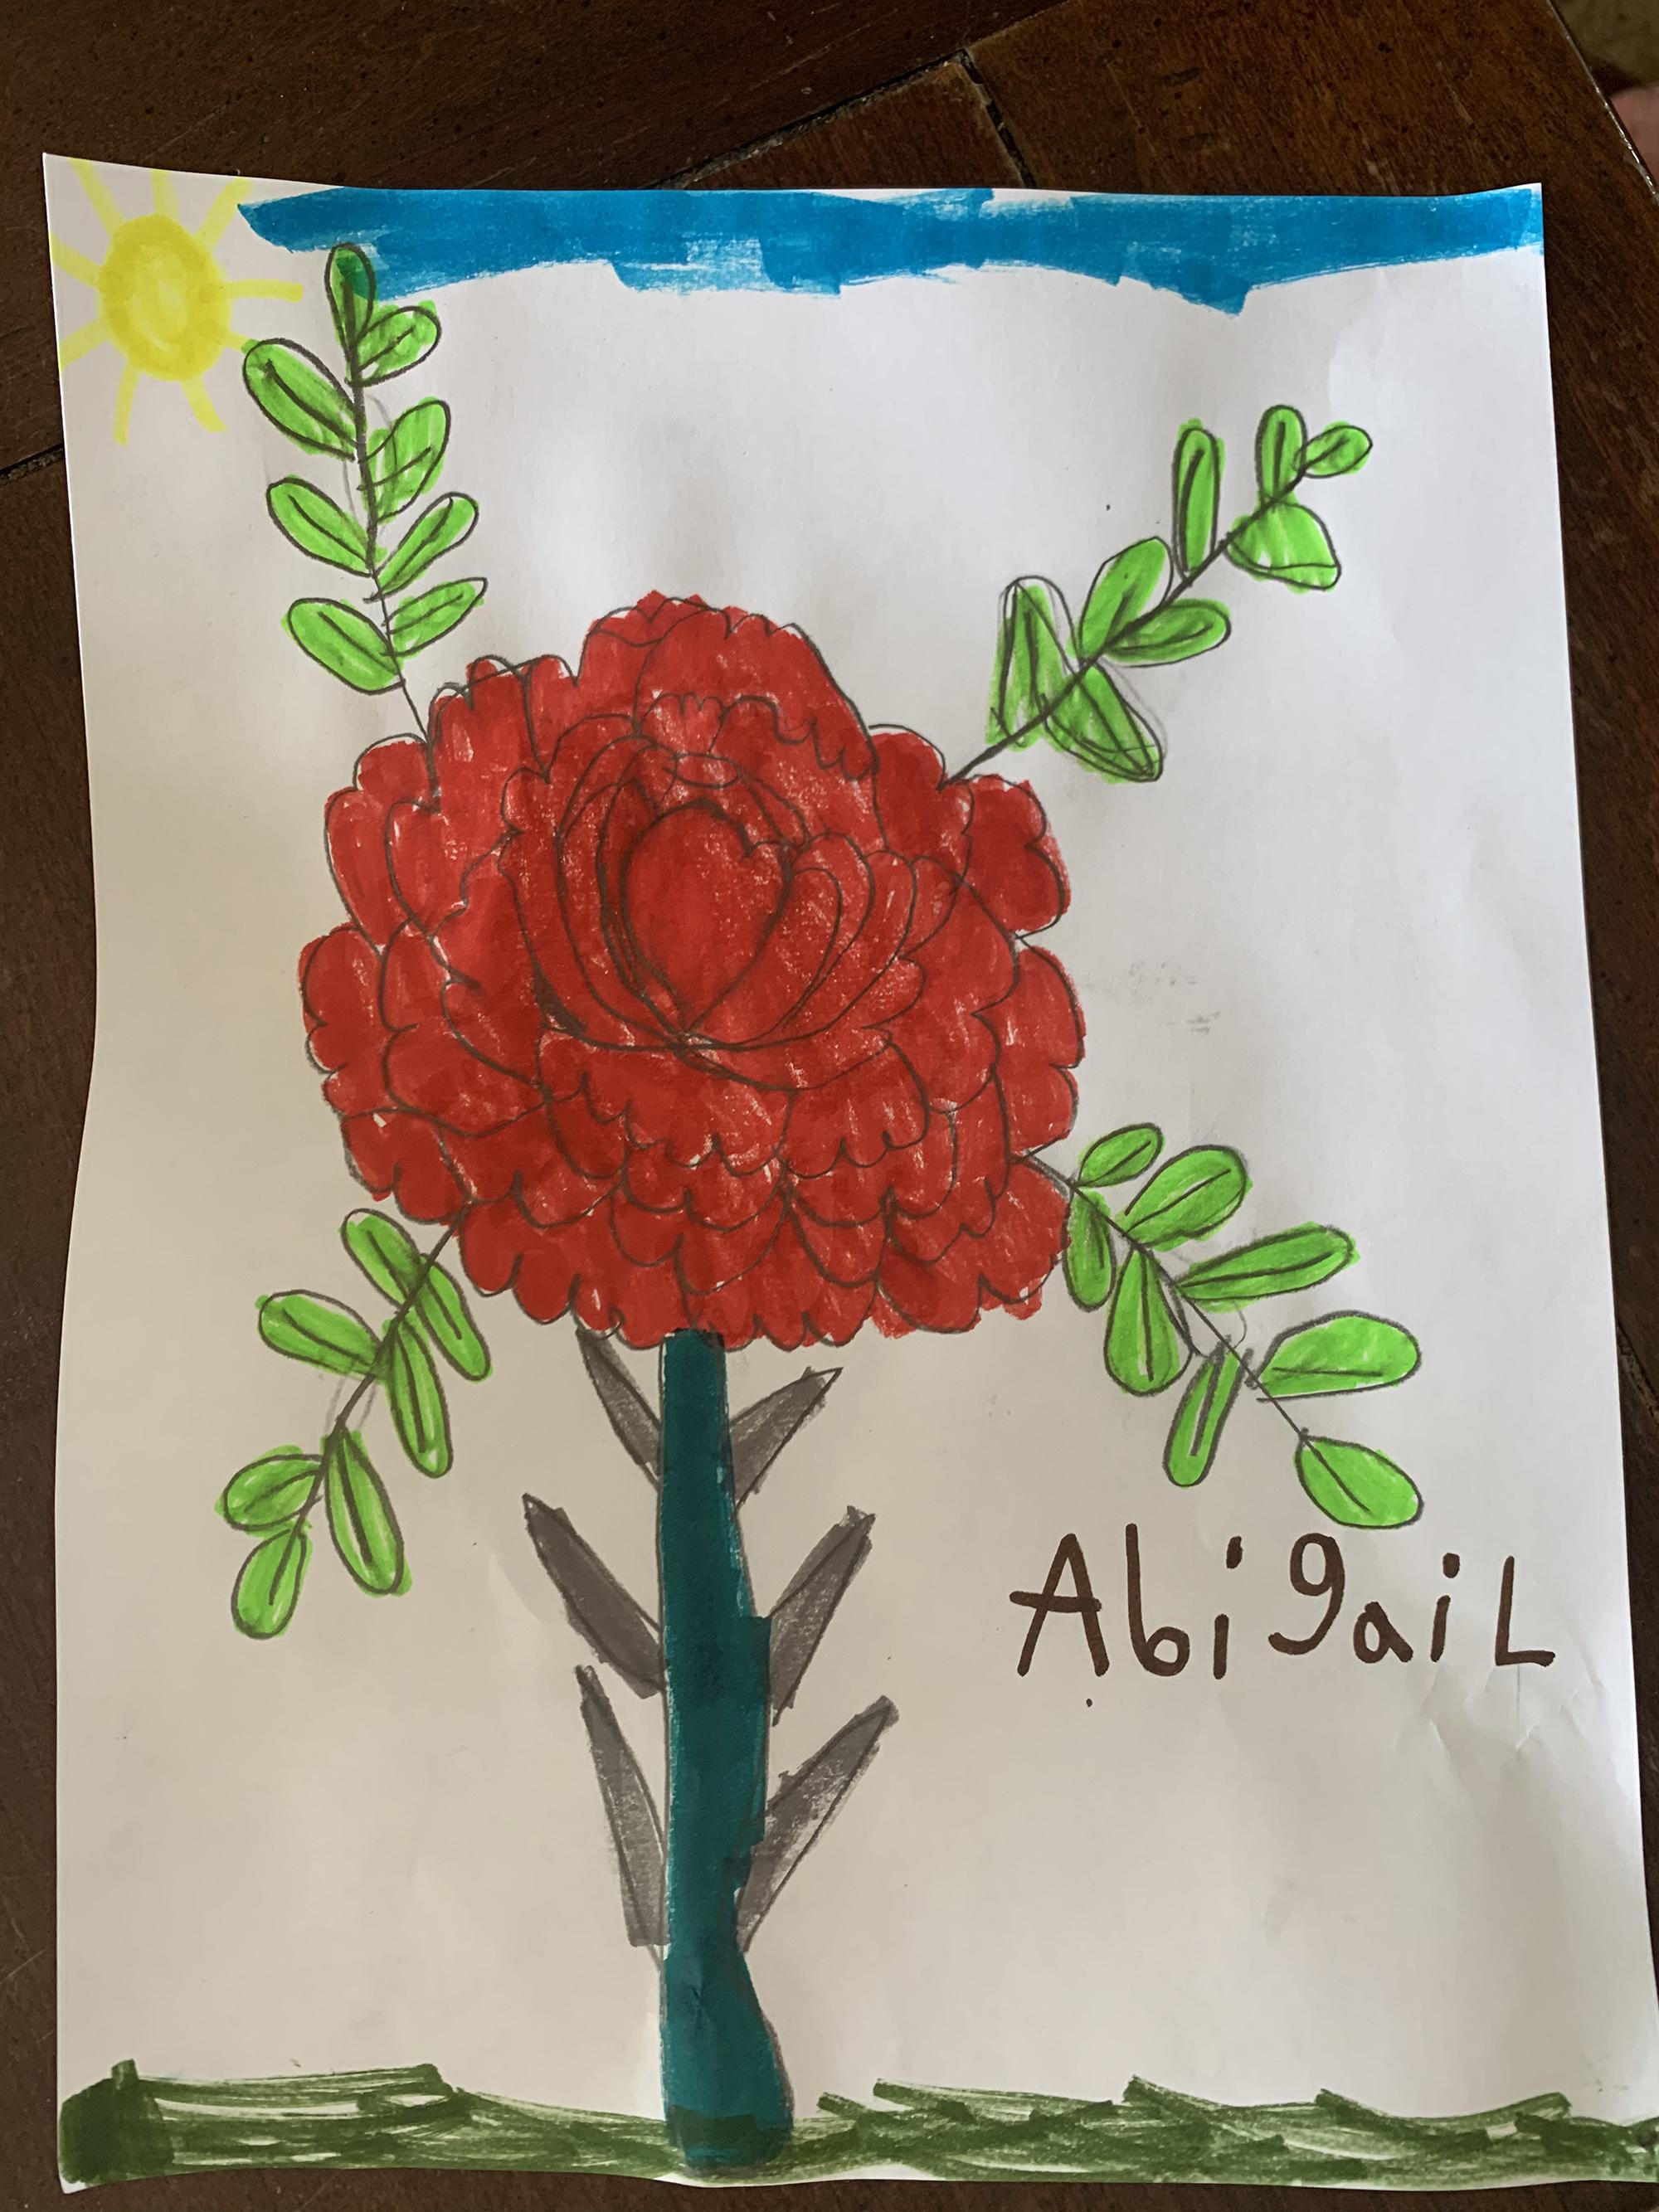 2nd. Abigail  Bruhn, flower